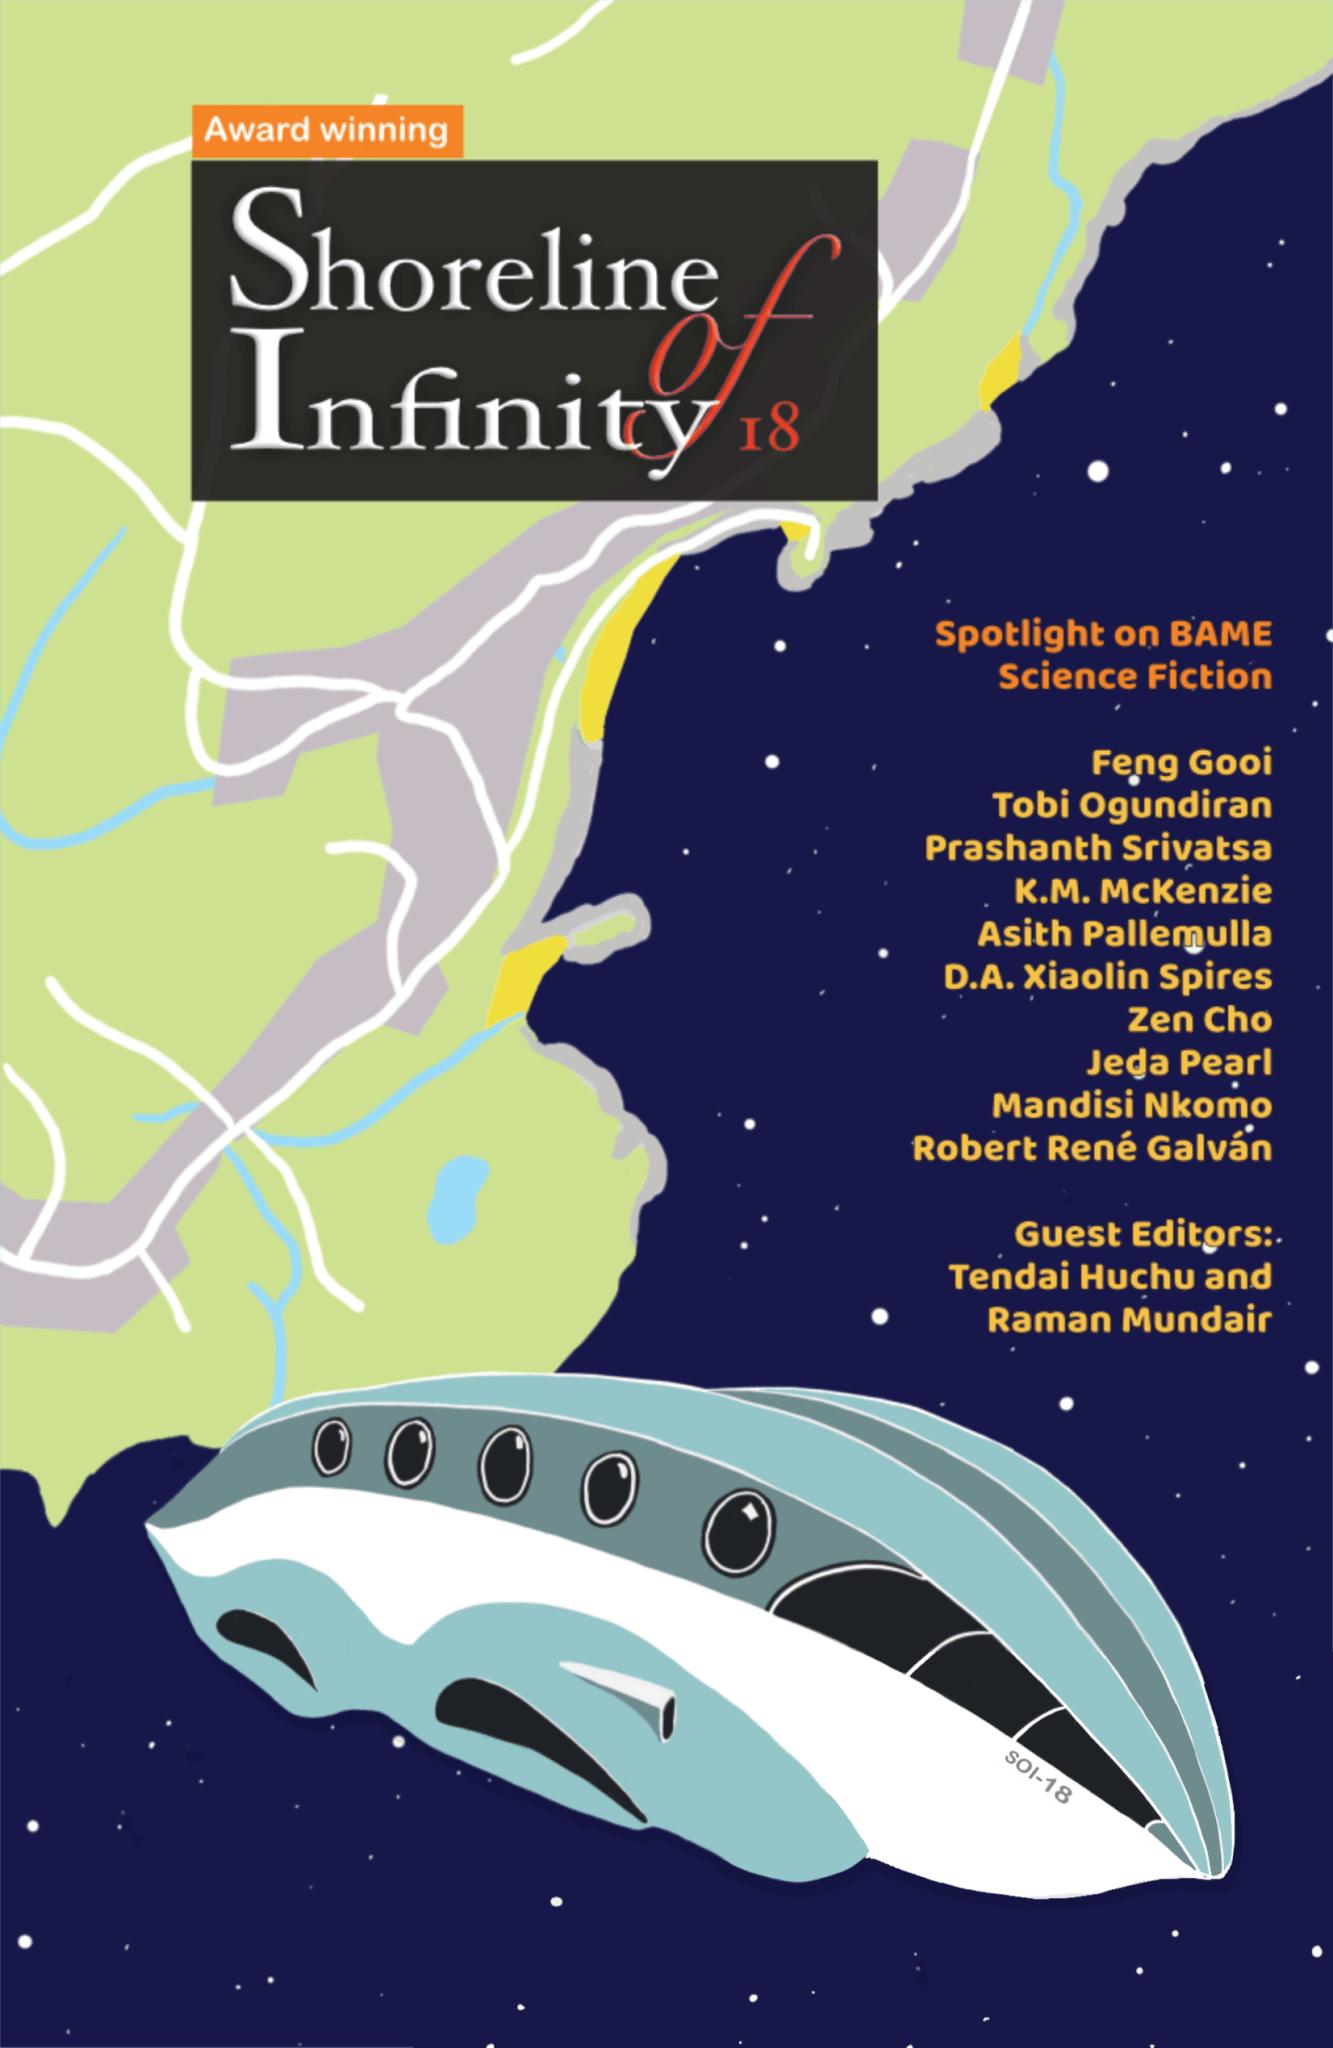 Shoreline of Infinity 18: Spotlight on BAME science fiction